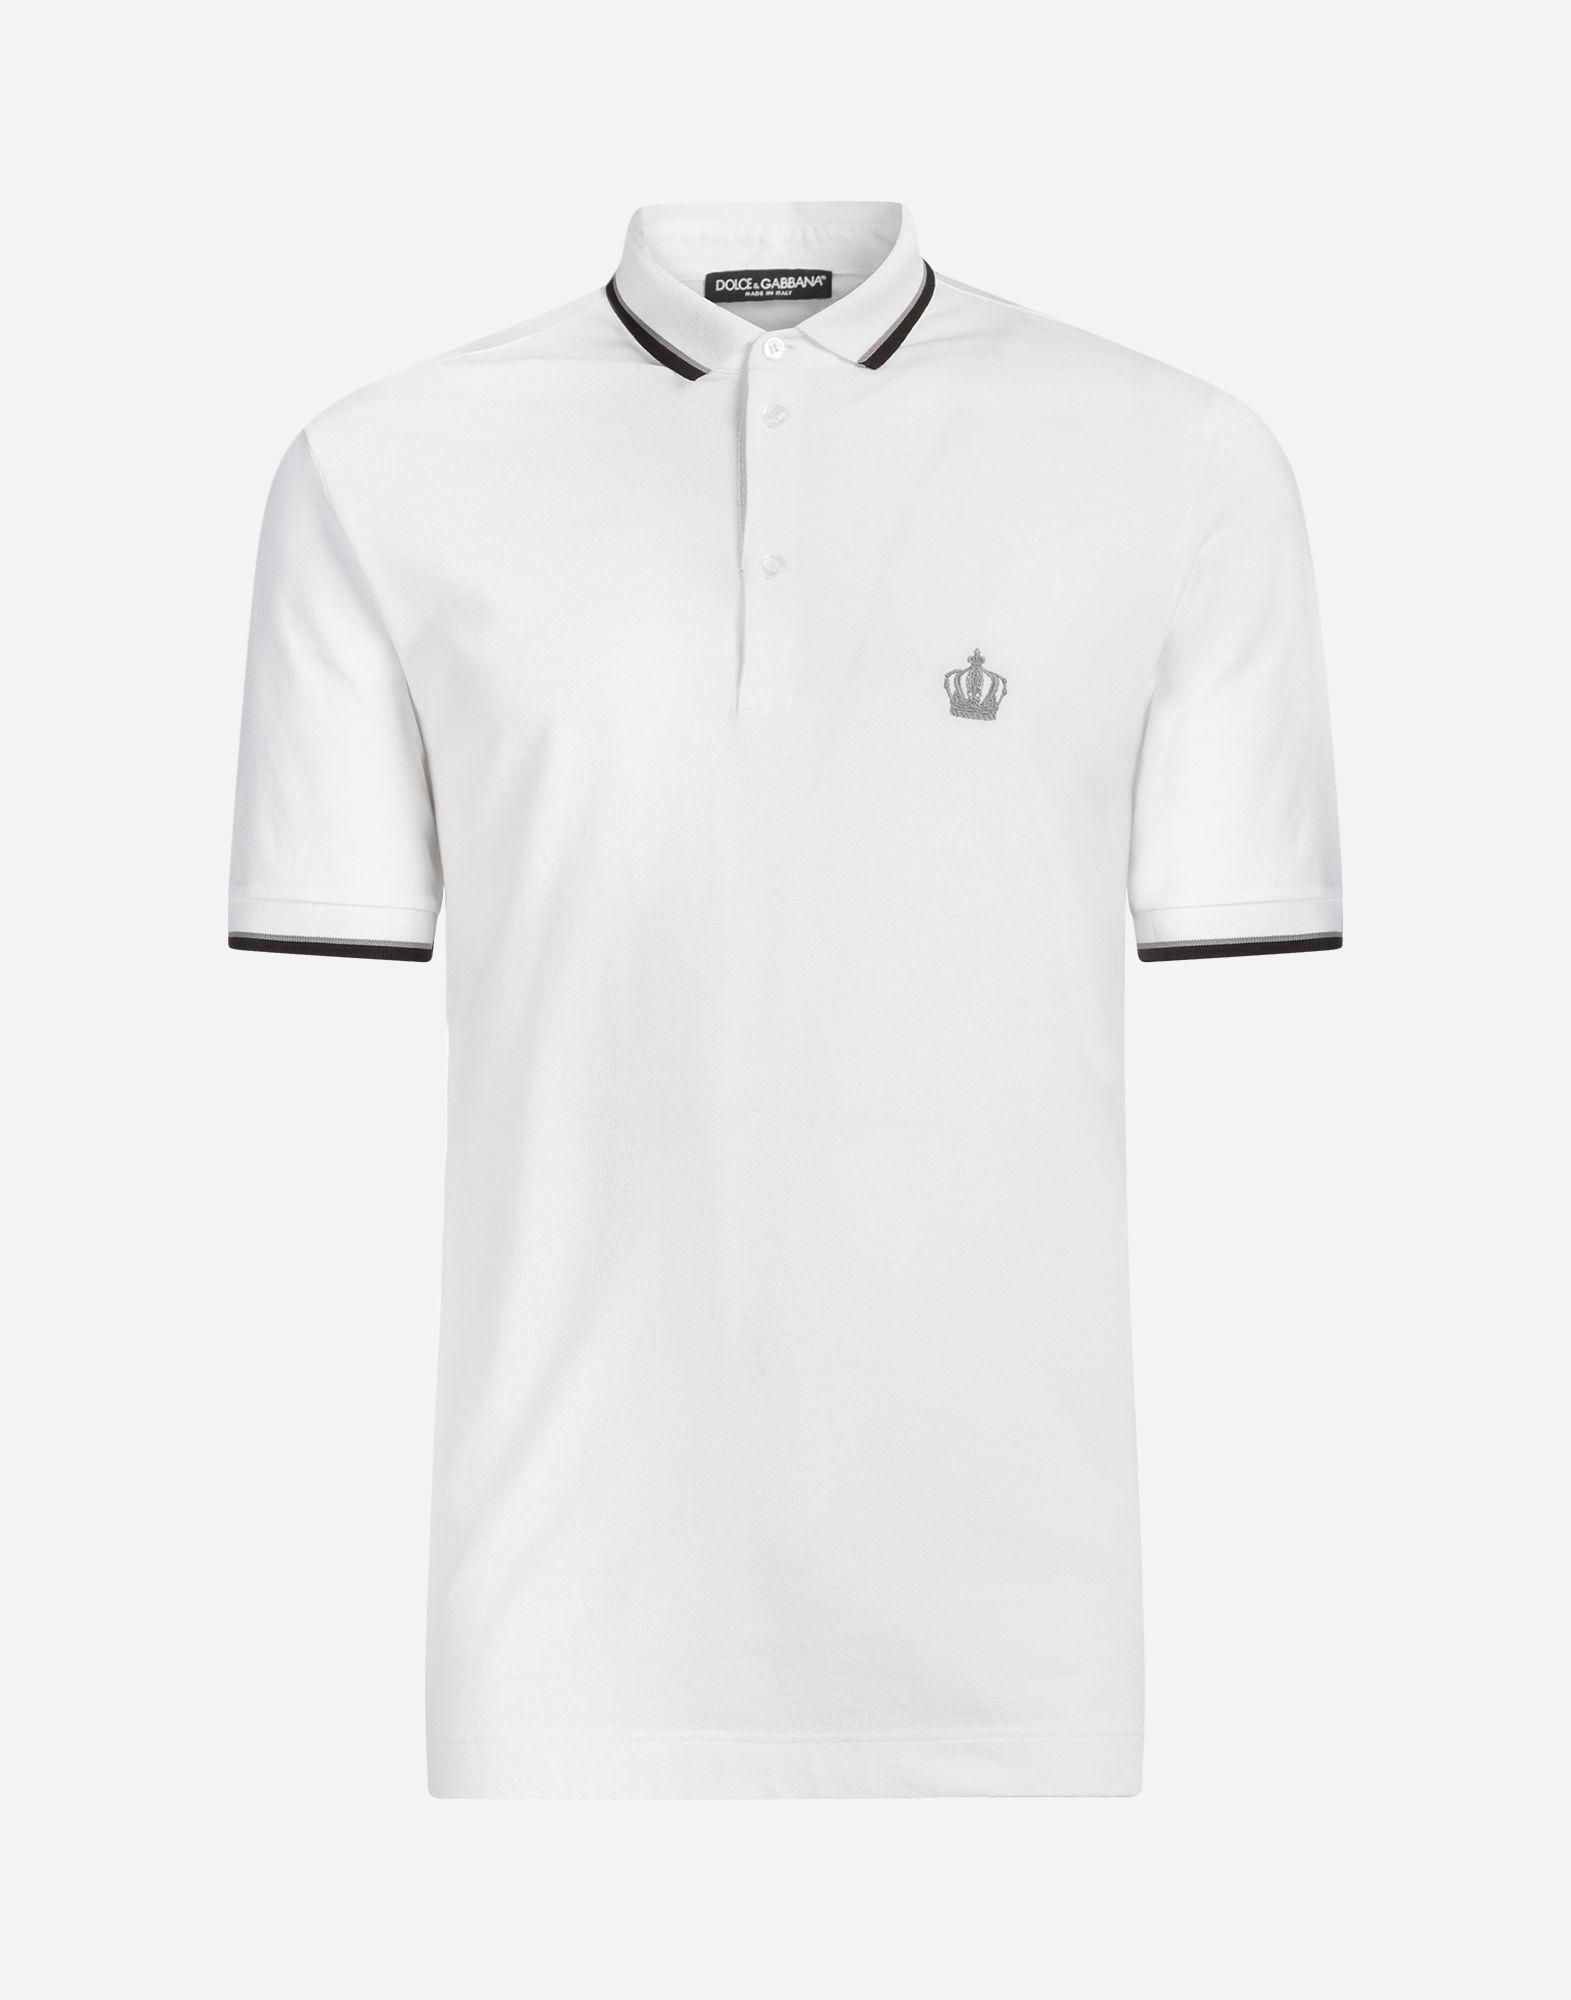 99204d9c7dd46 Mens Designer Polo Shirts Tk Maxx